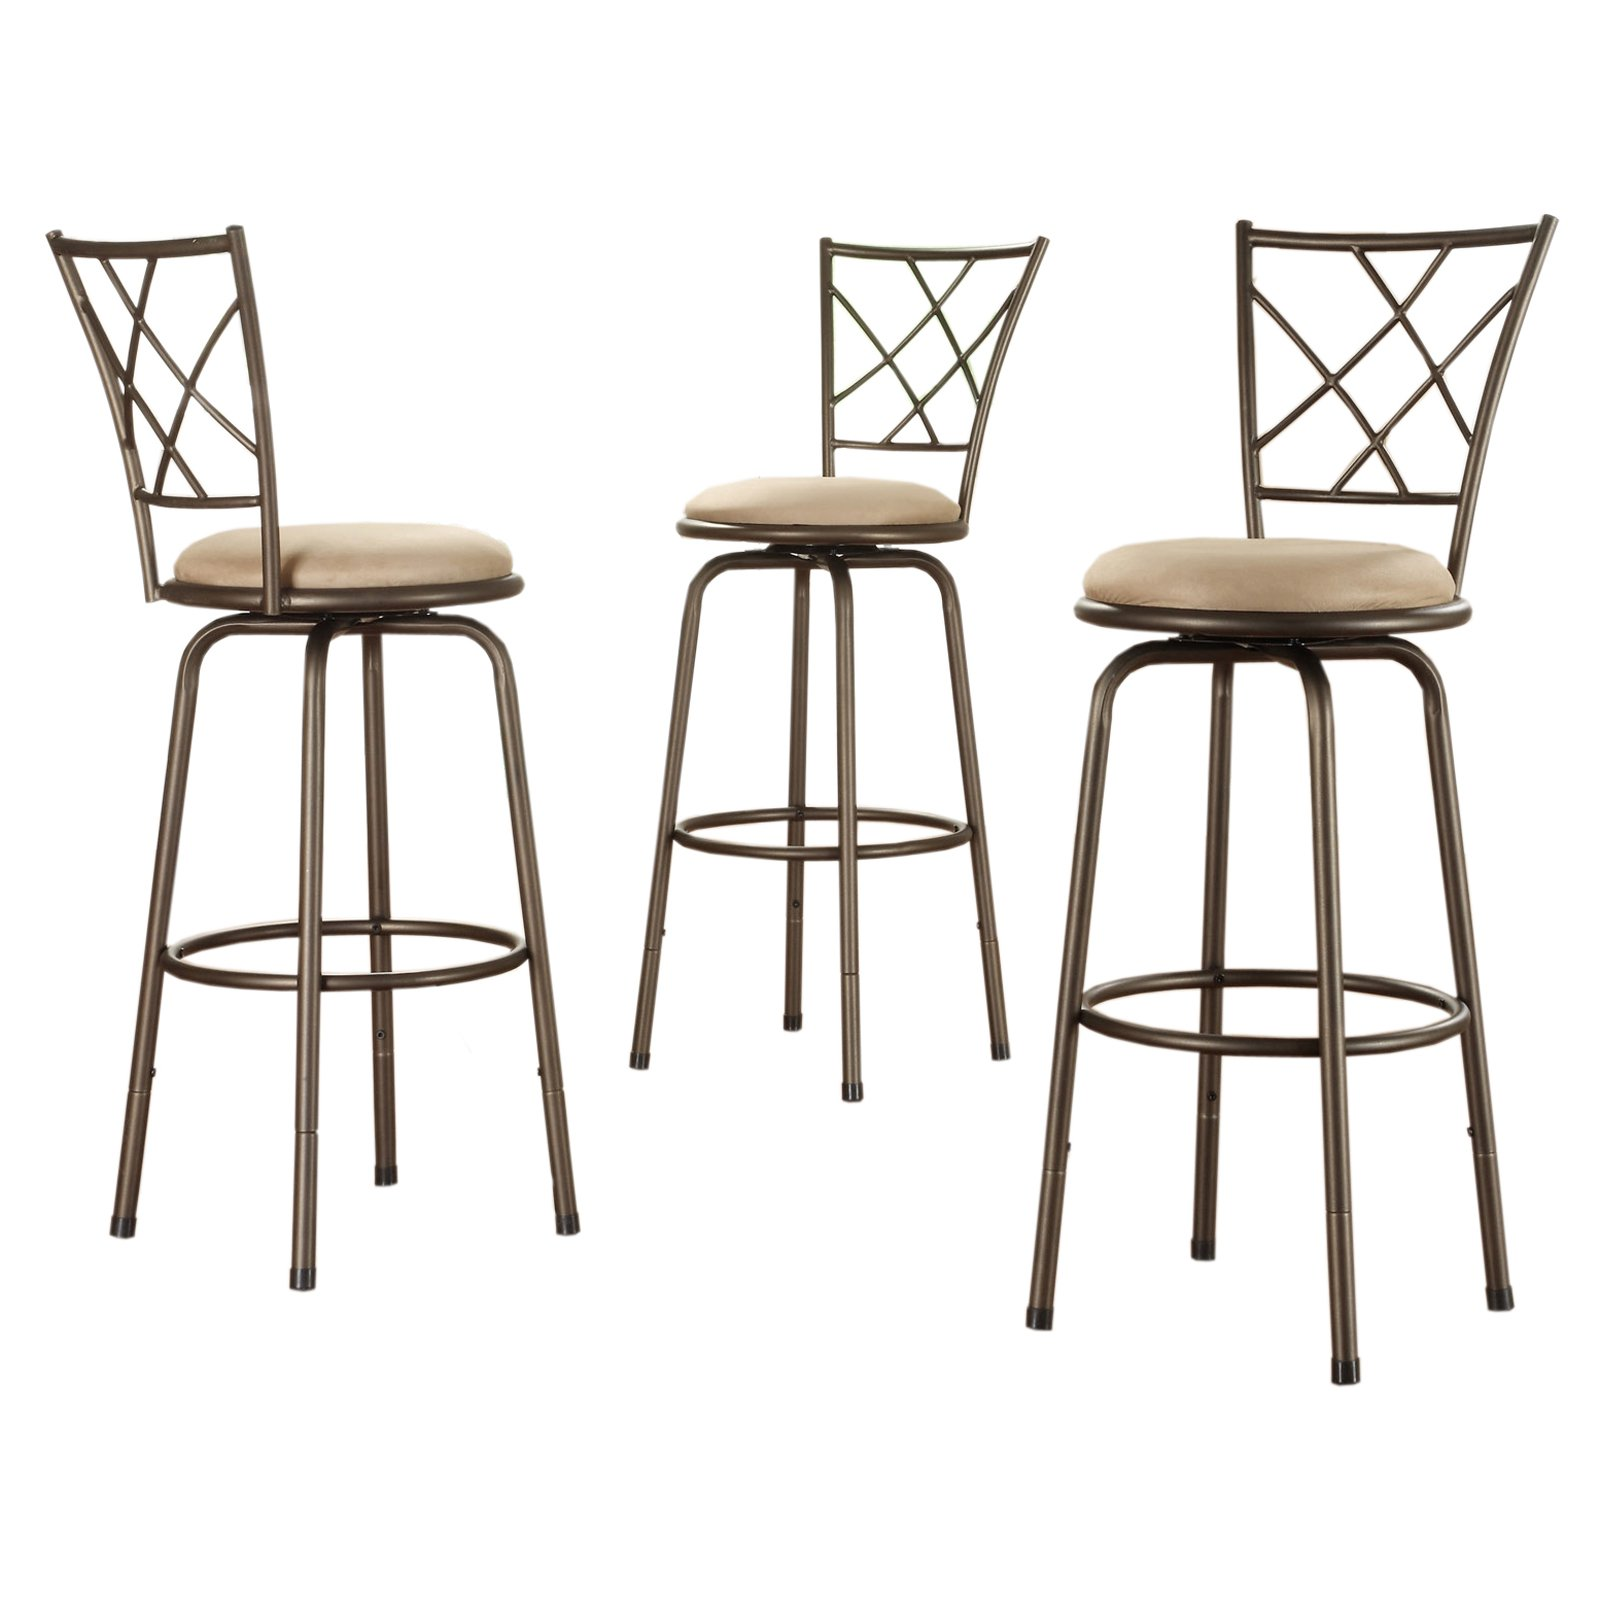 "Weston Home X-Back Adjustable Kitchen Bar Stools - 24"" to 29"", Set of 3 Bar stools"